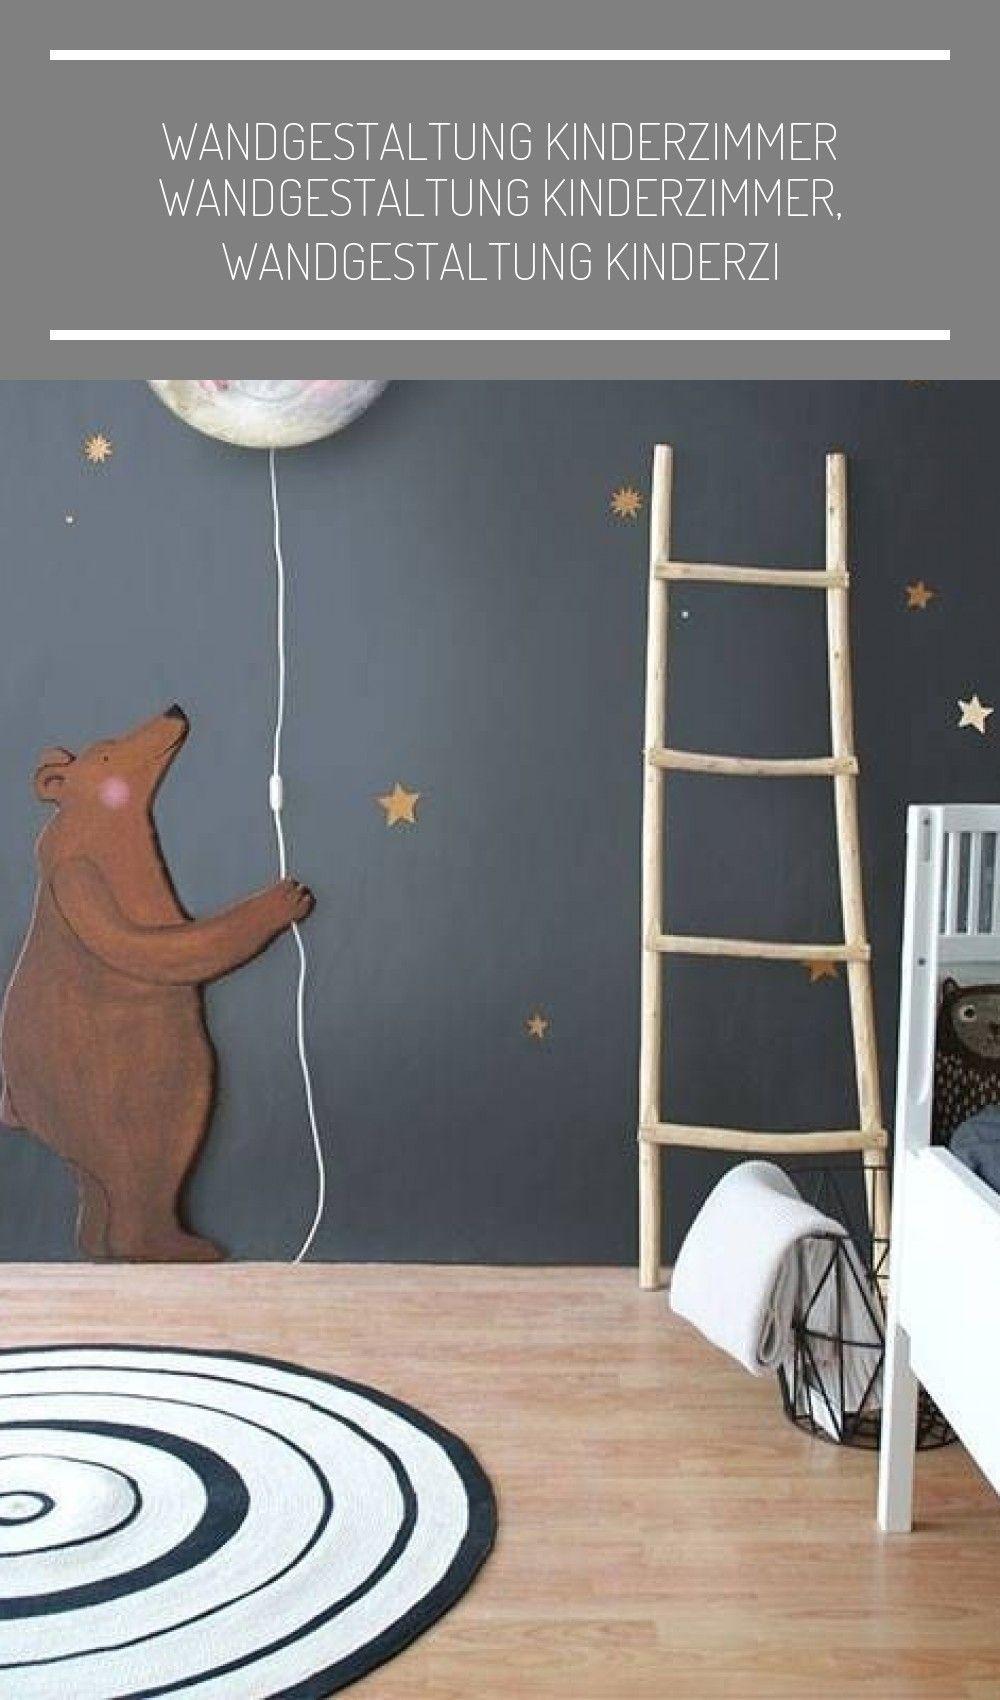 Wandgestaltung Kinderzimmer Jungen Kinderzi Kinde In Regal Weiß Sofa Regale